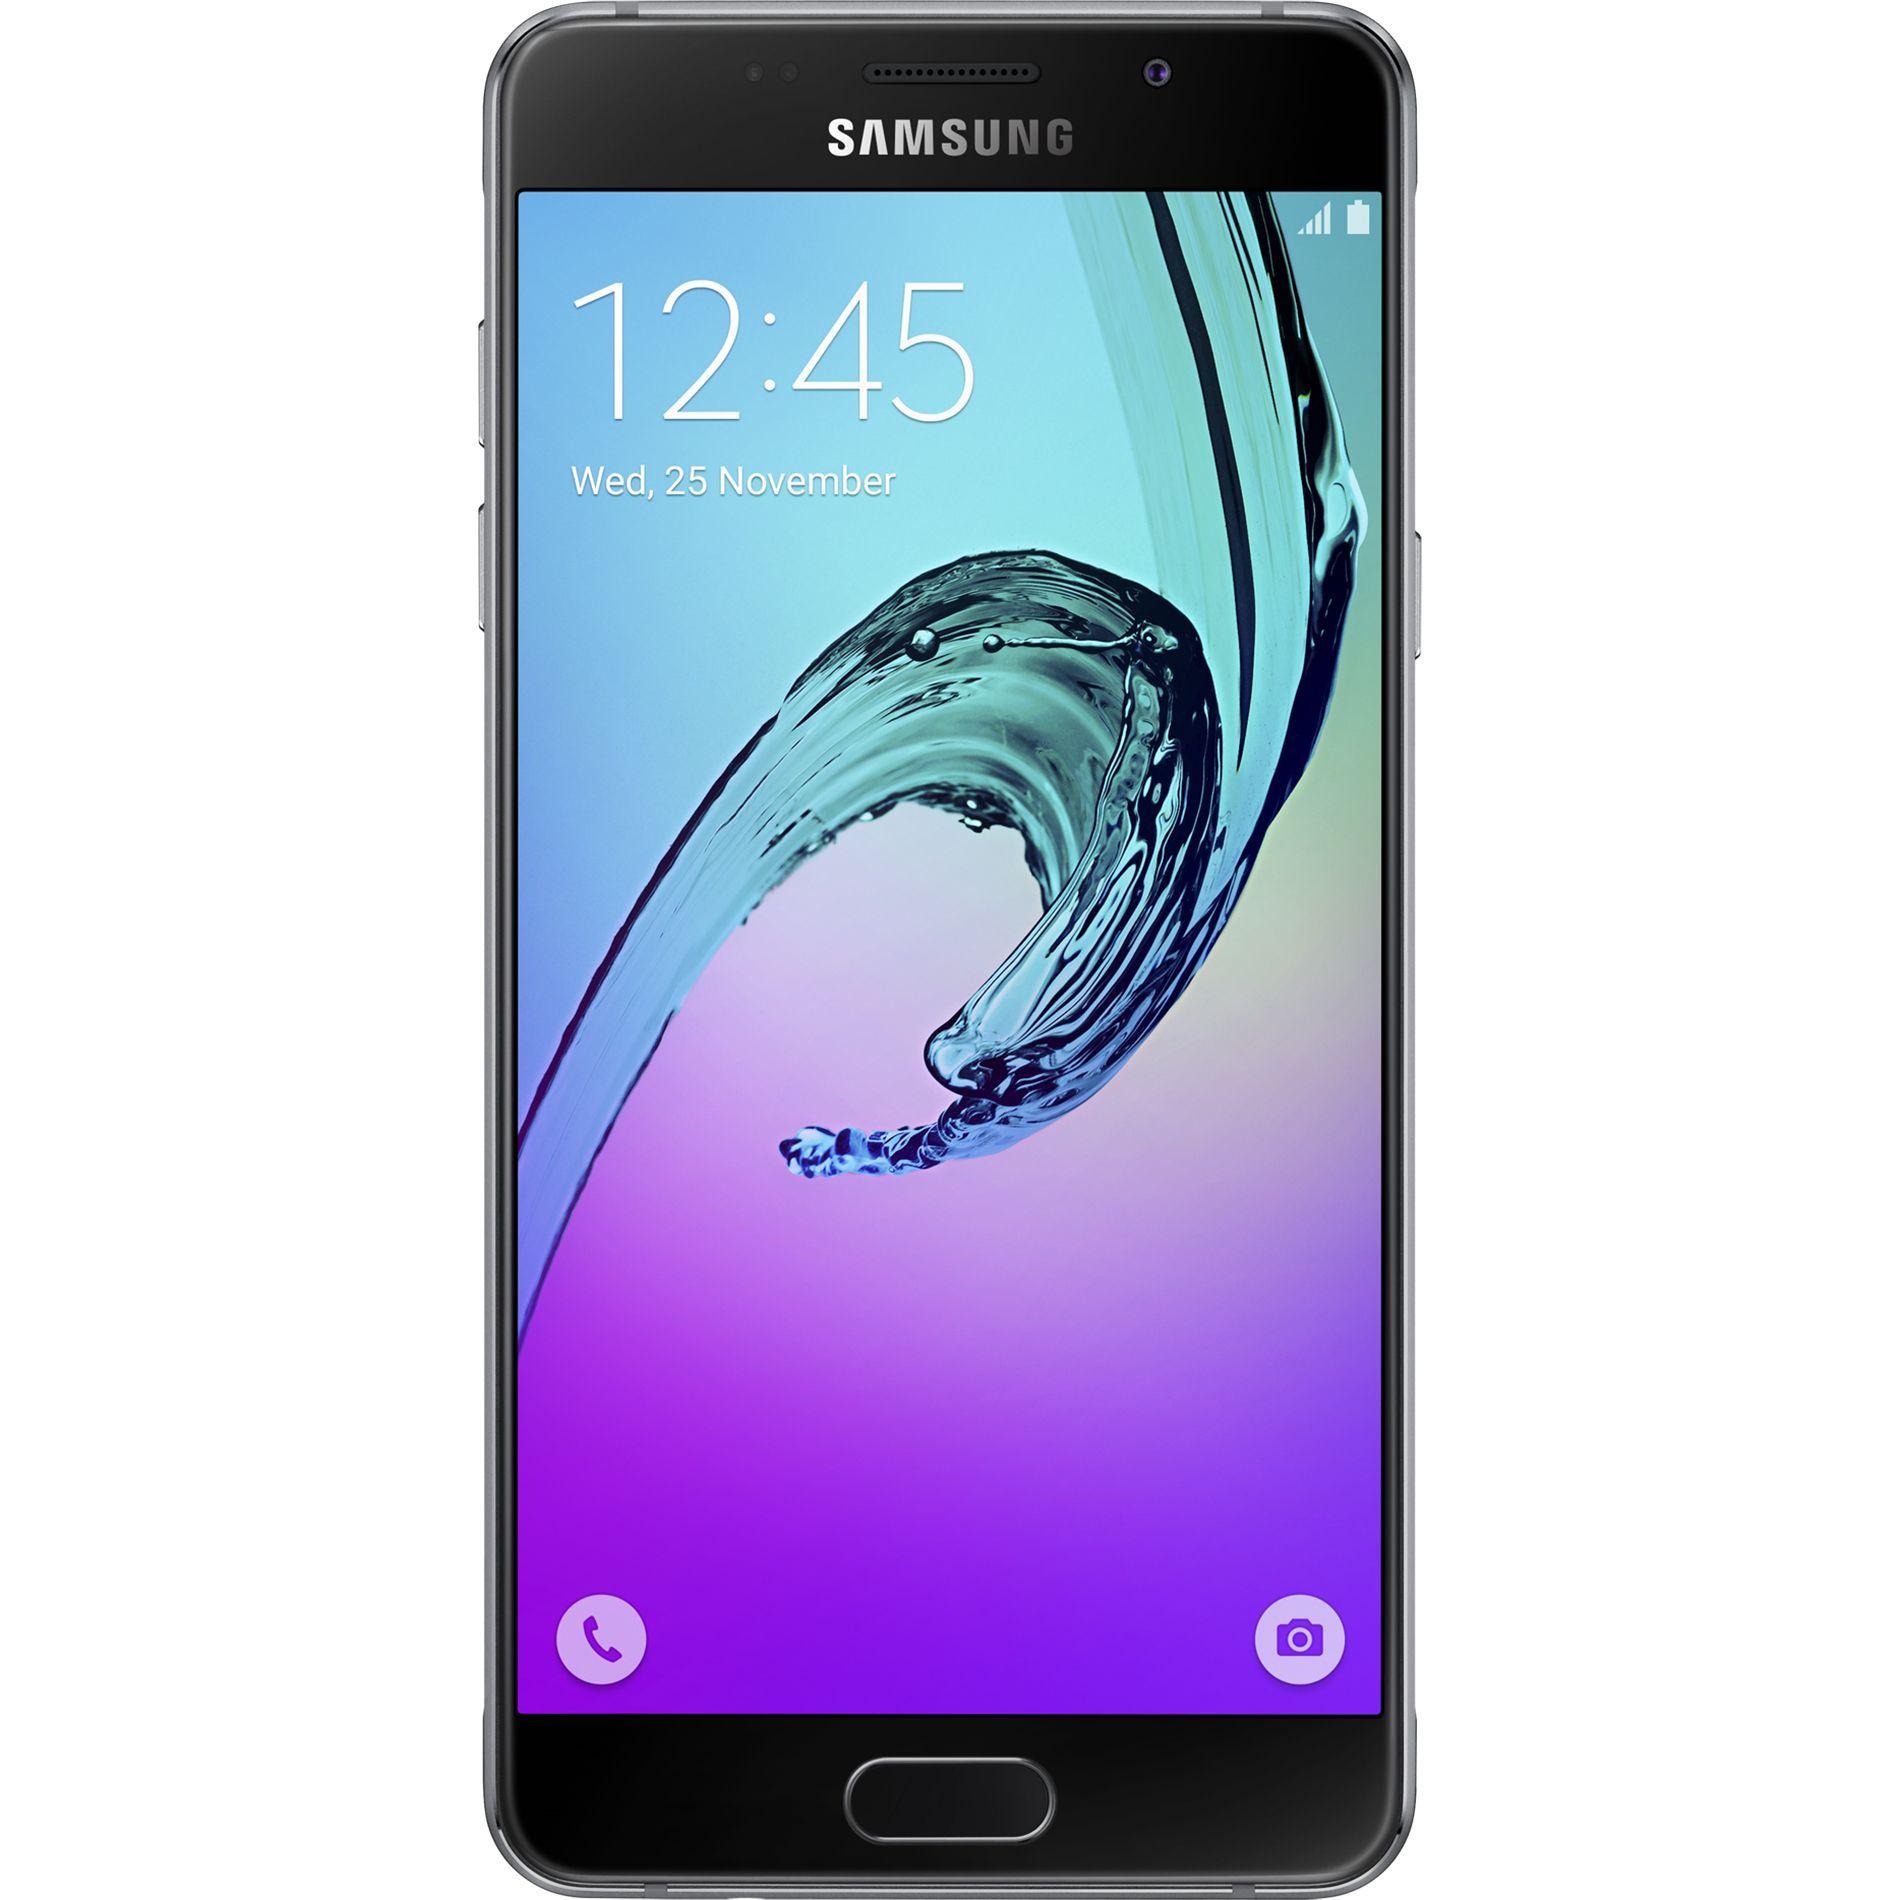 Smartfon Samsung Galaxy A3 2016 16gb 4g Black Bezplatna Dostavka Cena 529 99lv Link Za Porchka Http Bit Ly Samsung Galaxy Samsung Samsung Galaxy A3